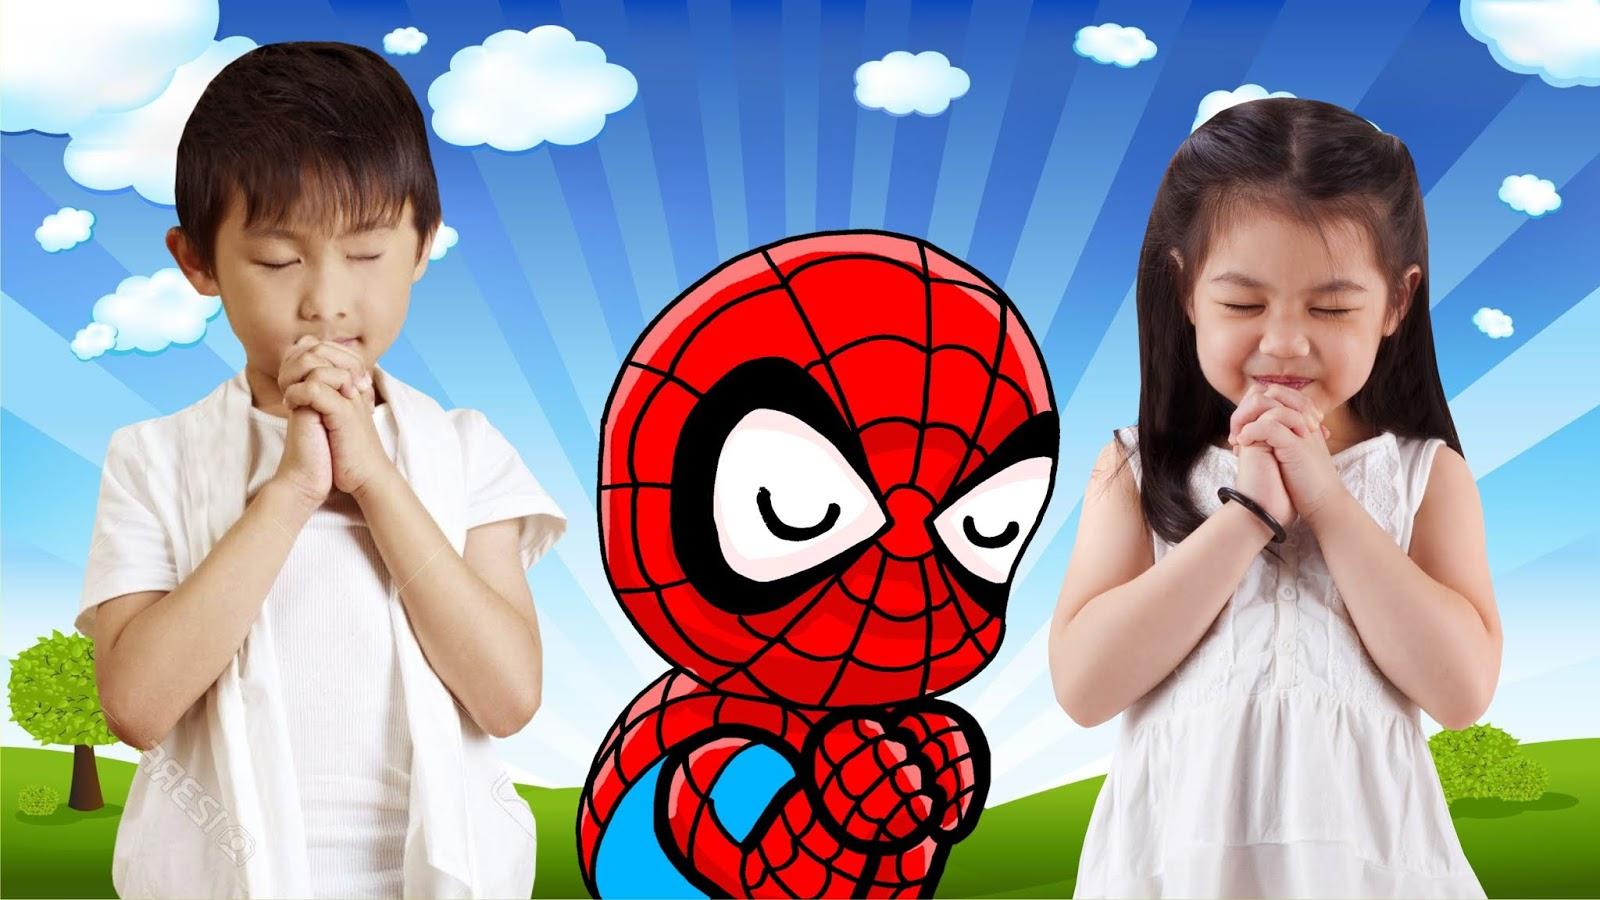 1001 Gambar Animasi Tangan Berdoa Kristen Cikimm Com